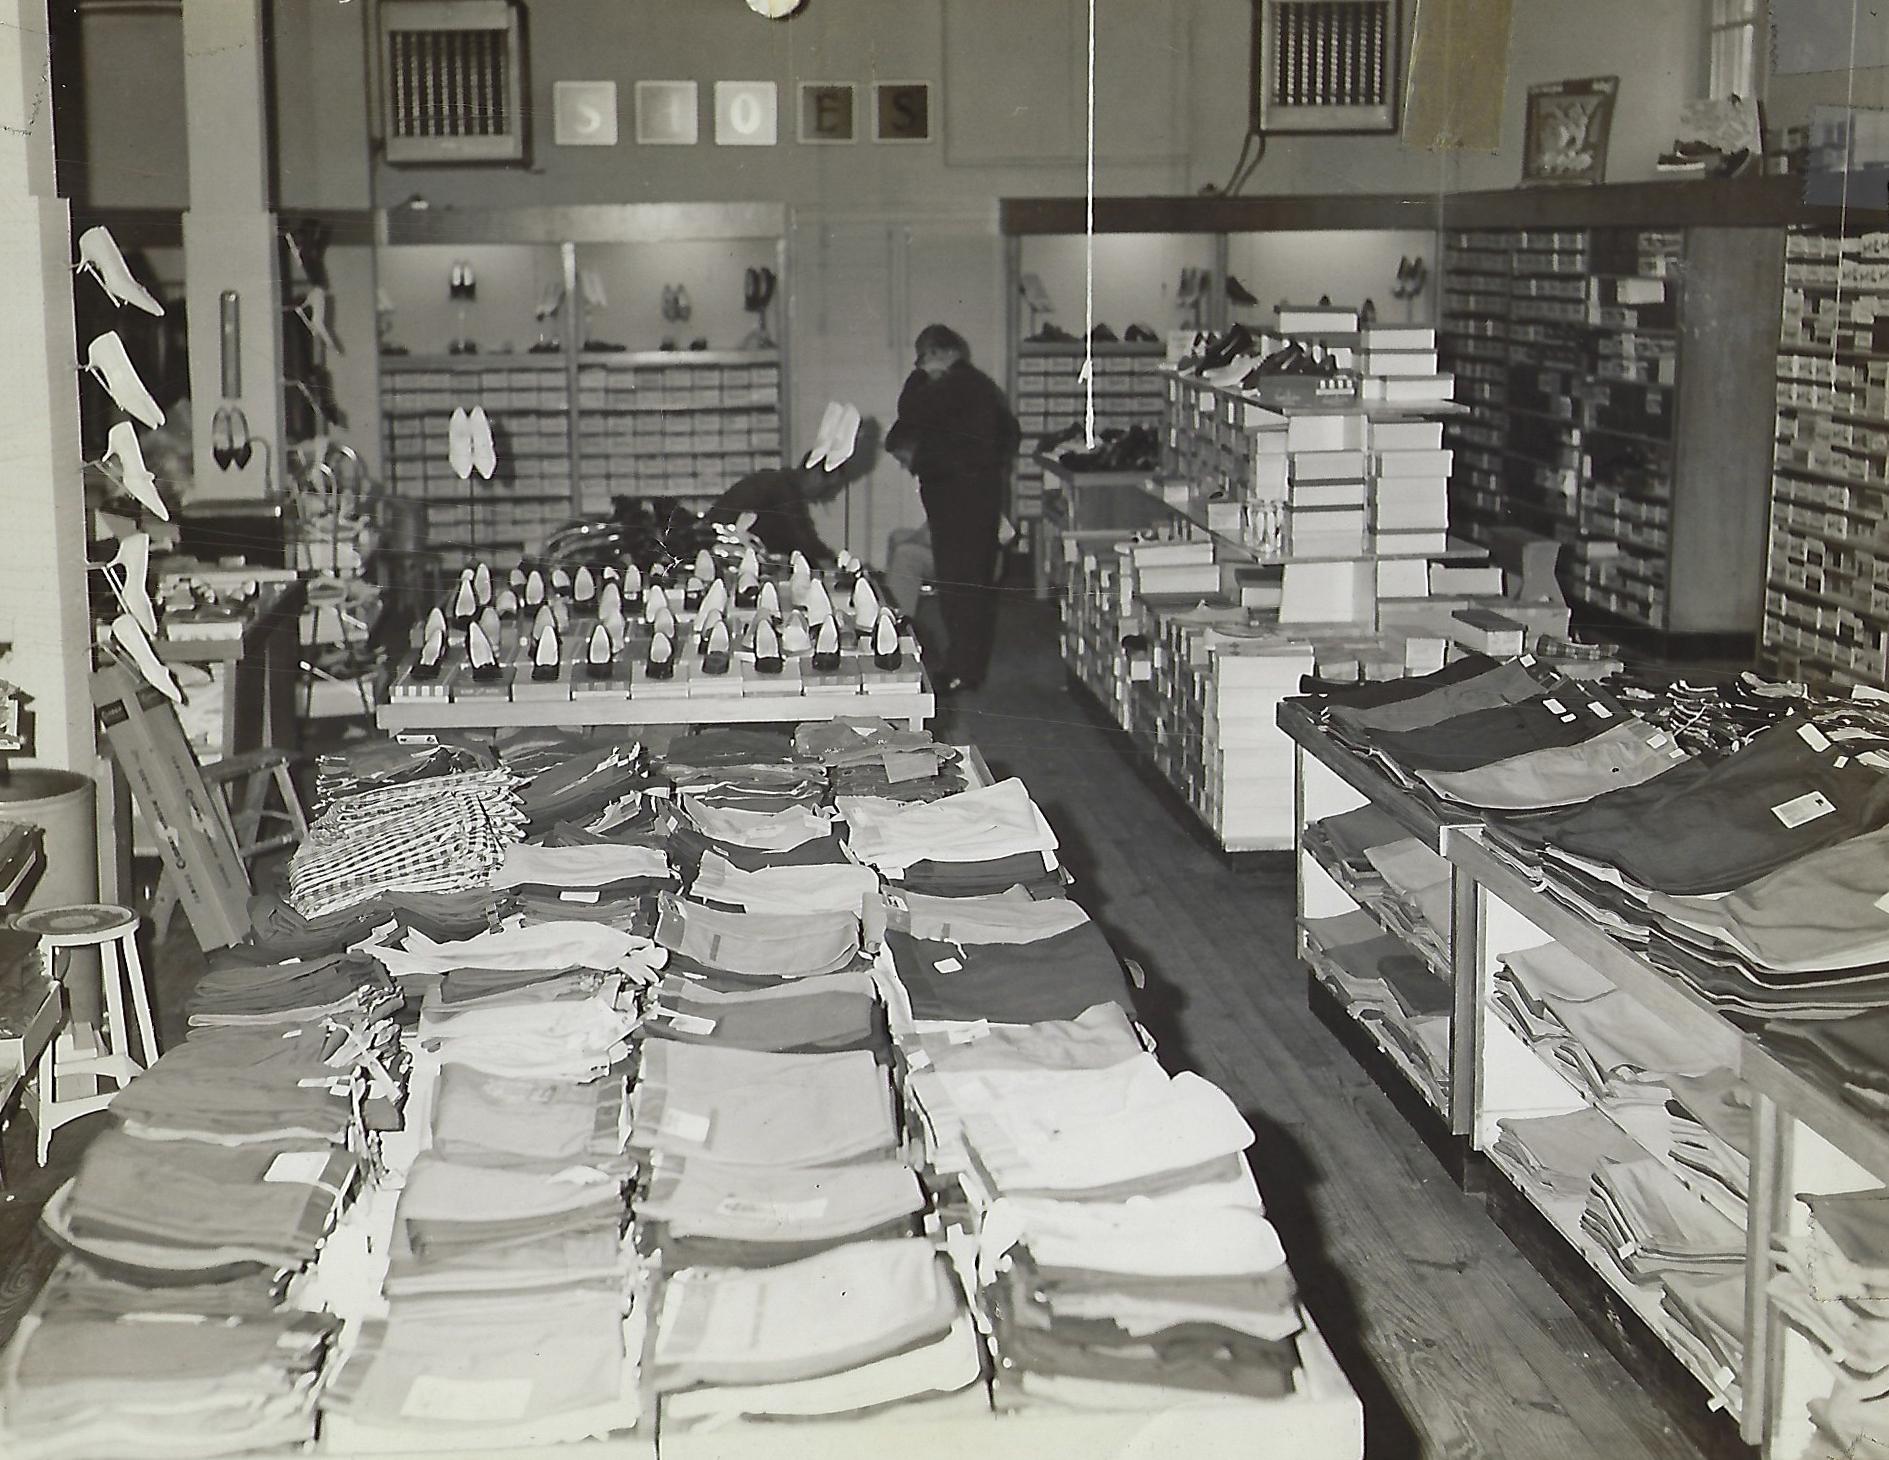 St_George_Widelitz_Department_Store_9